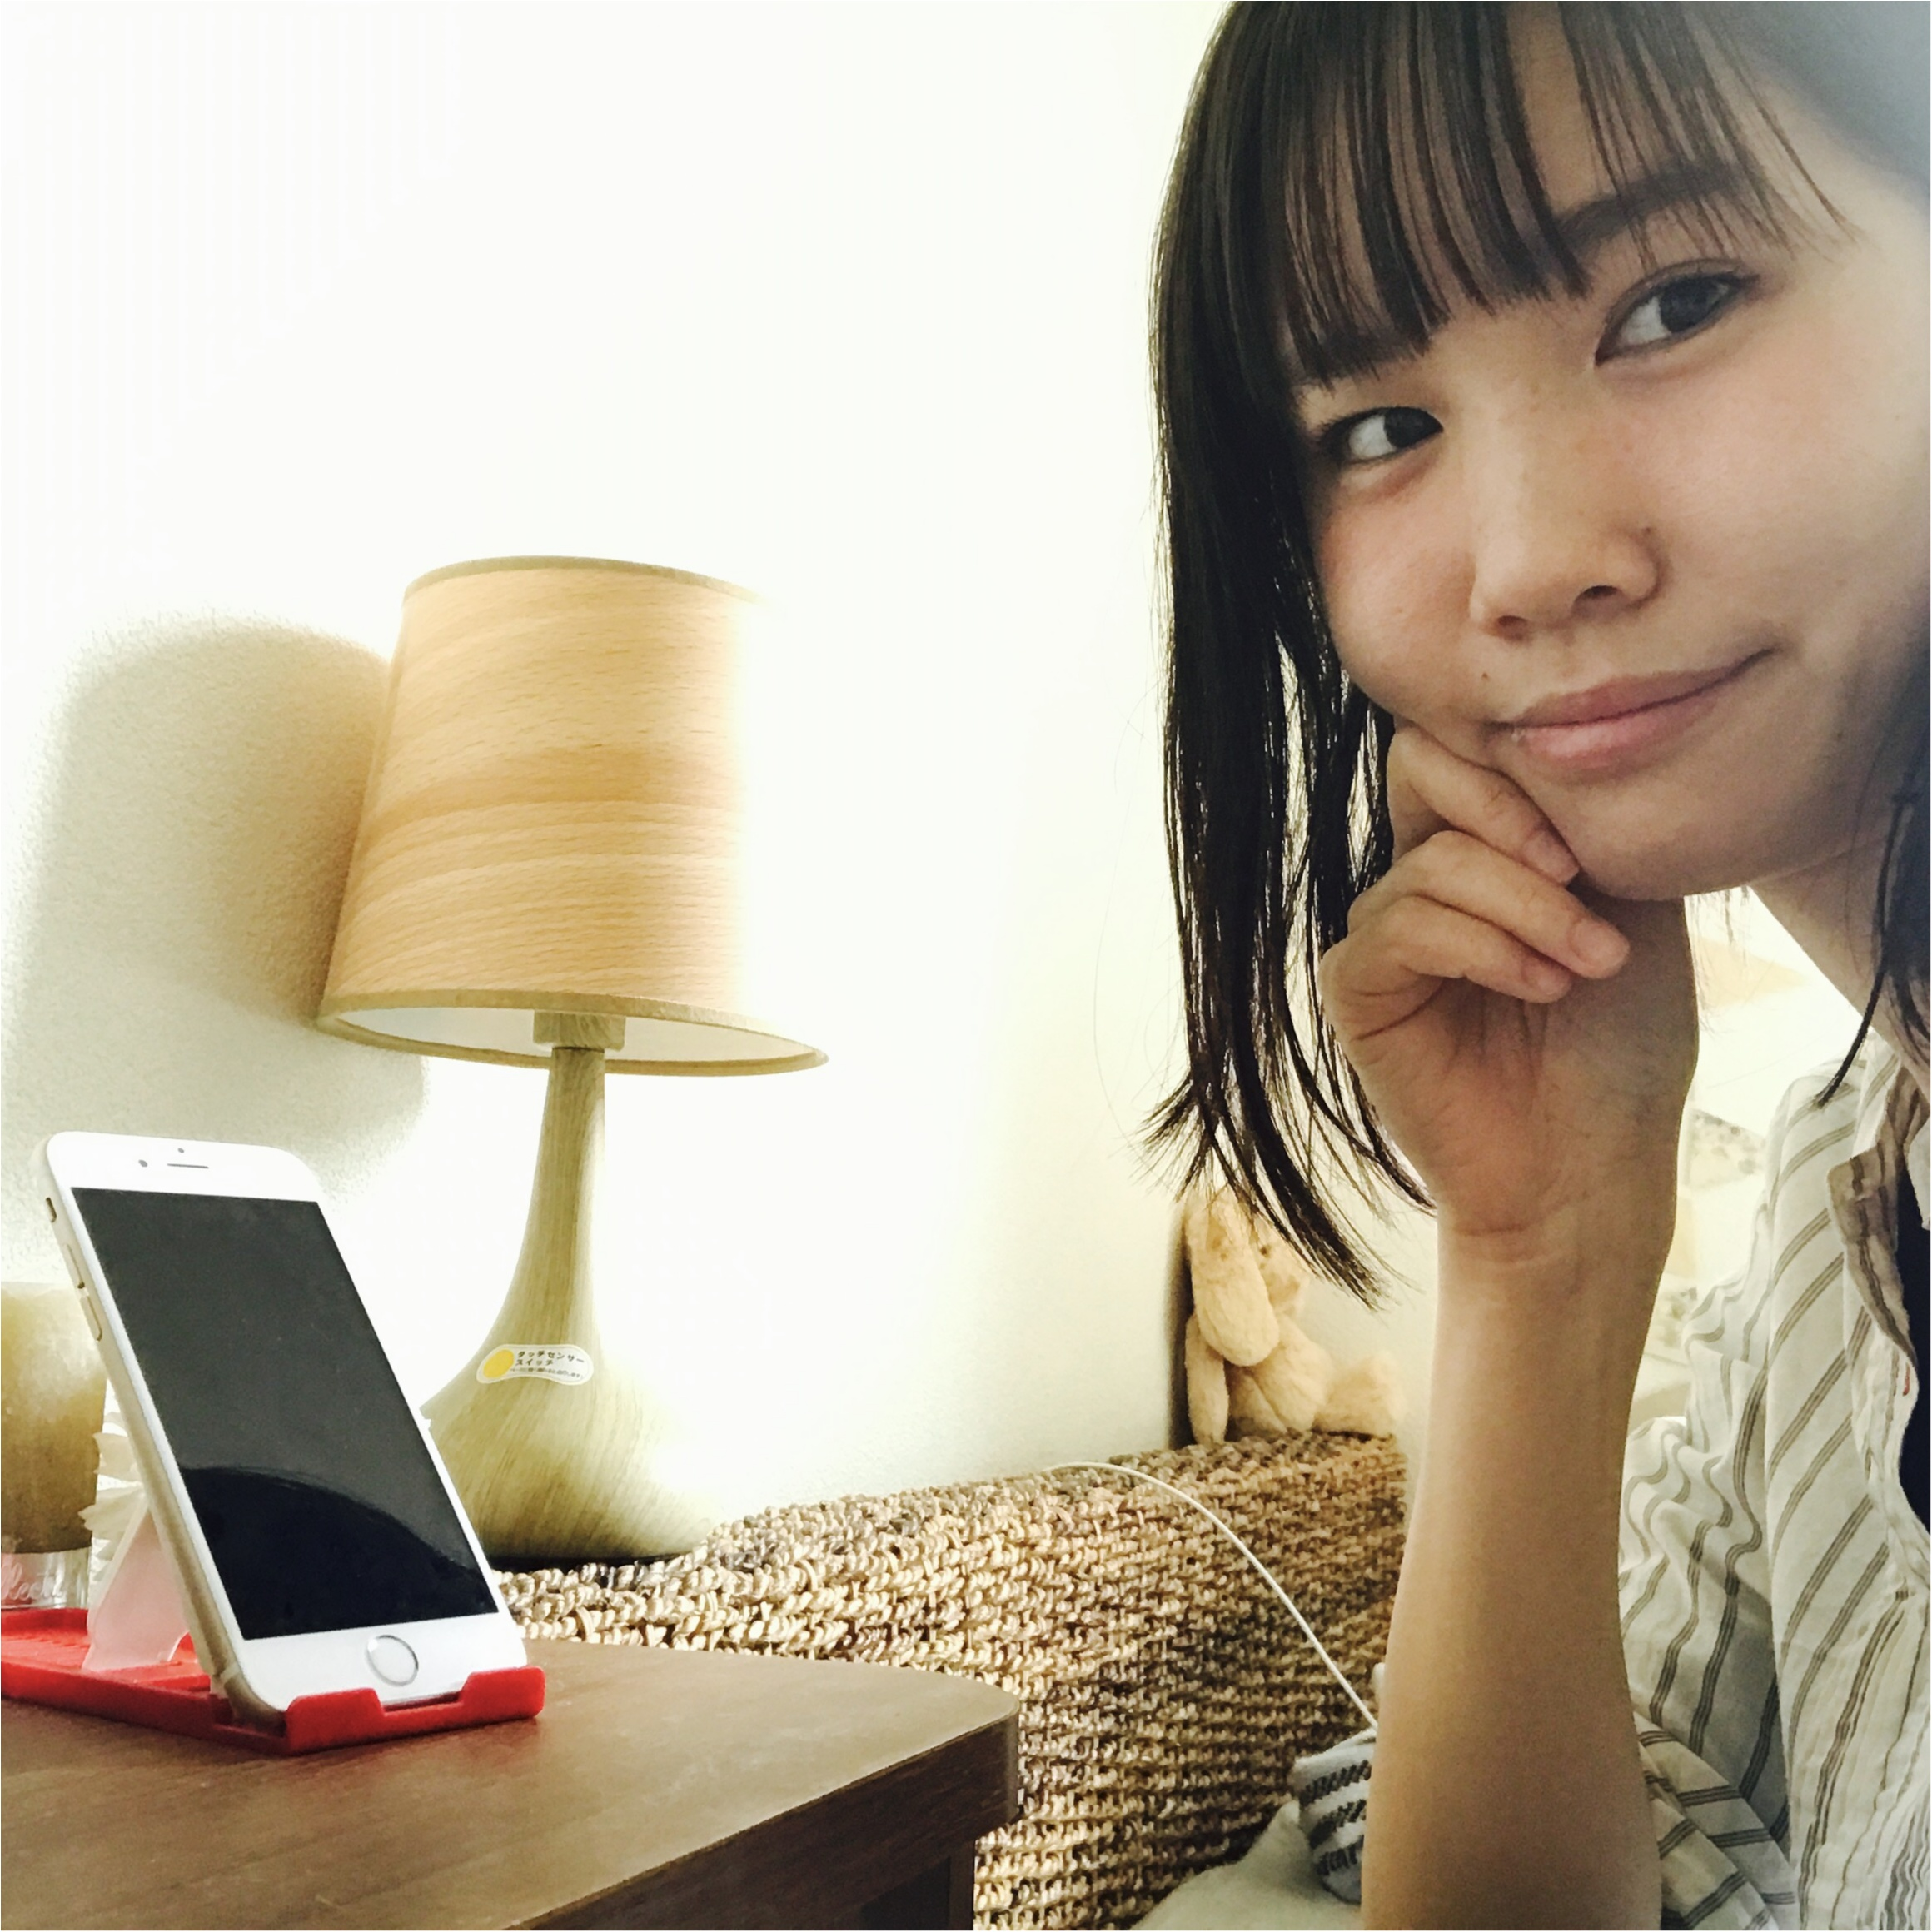 …ஐ 【MORE6月号】キュートすぎる桐谷美玲ちゃんの表紙が目印! 可愛すぎて、日常使いな特別付録のスヌーピースマートフォン用スタンド&ふかふかポーチを見逃すな〜♪ஐ¨_2